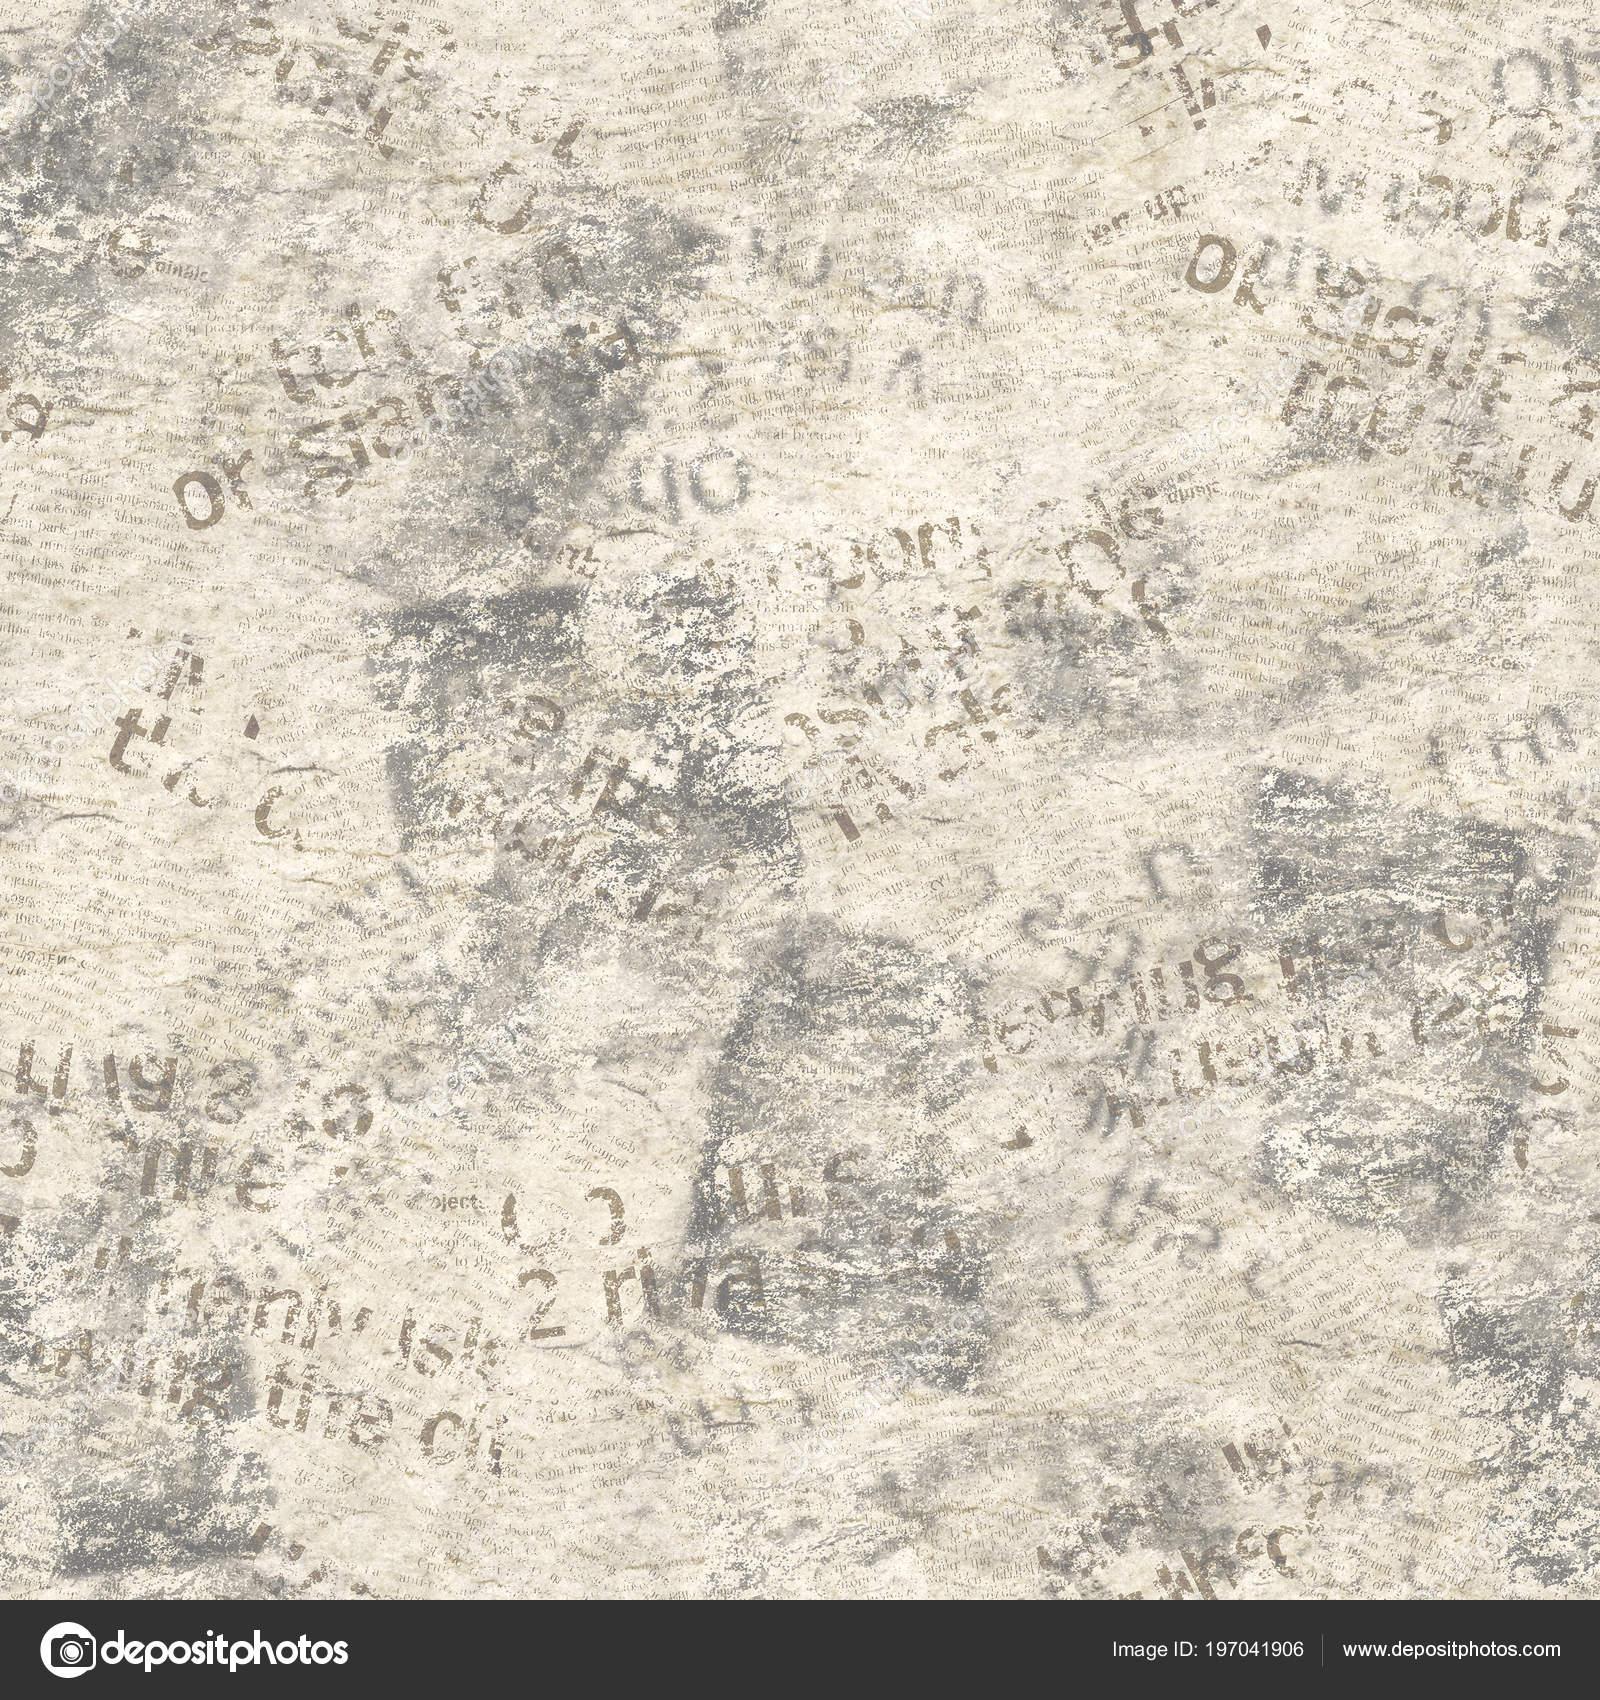 Old Grunge Newspaper Collage Seamless Pattern Unreadable Vintage